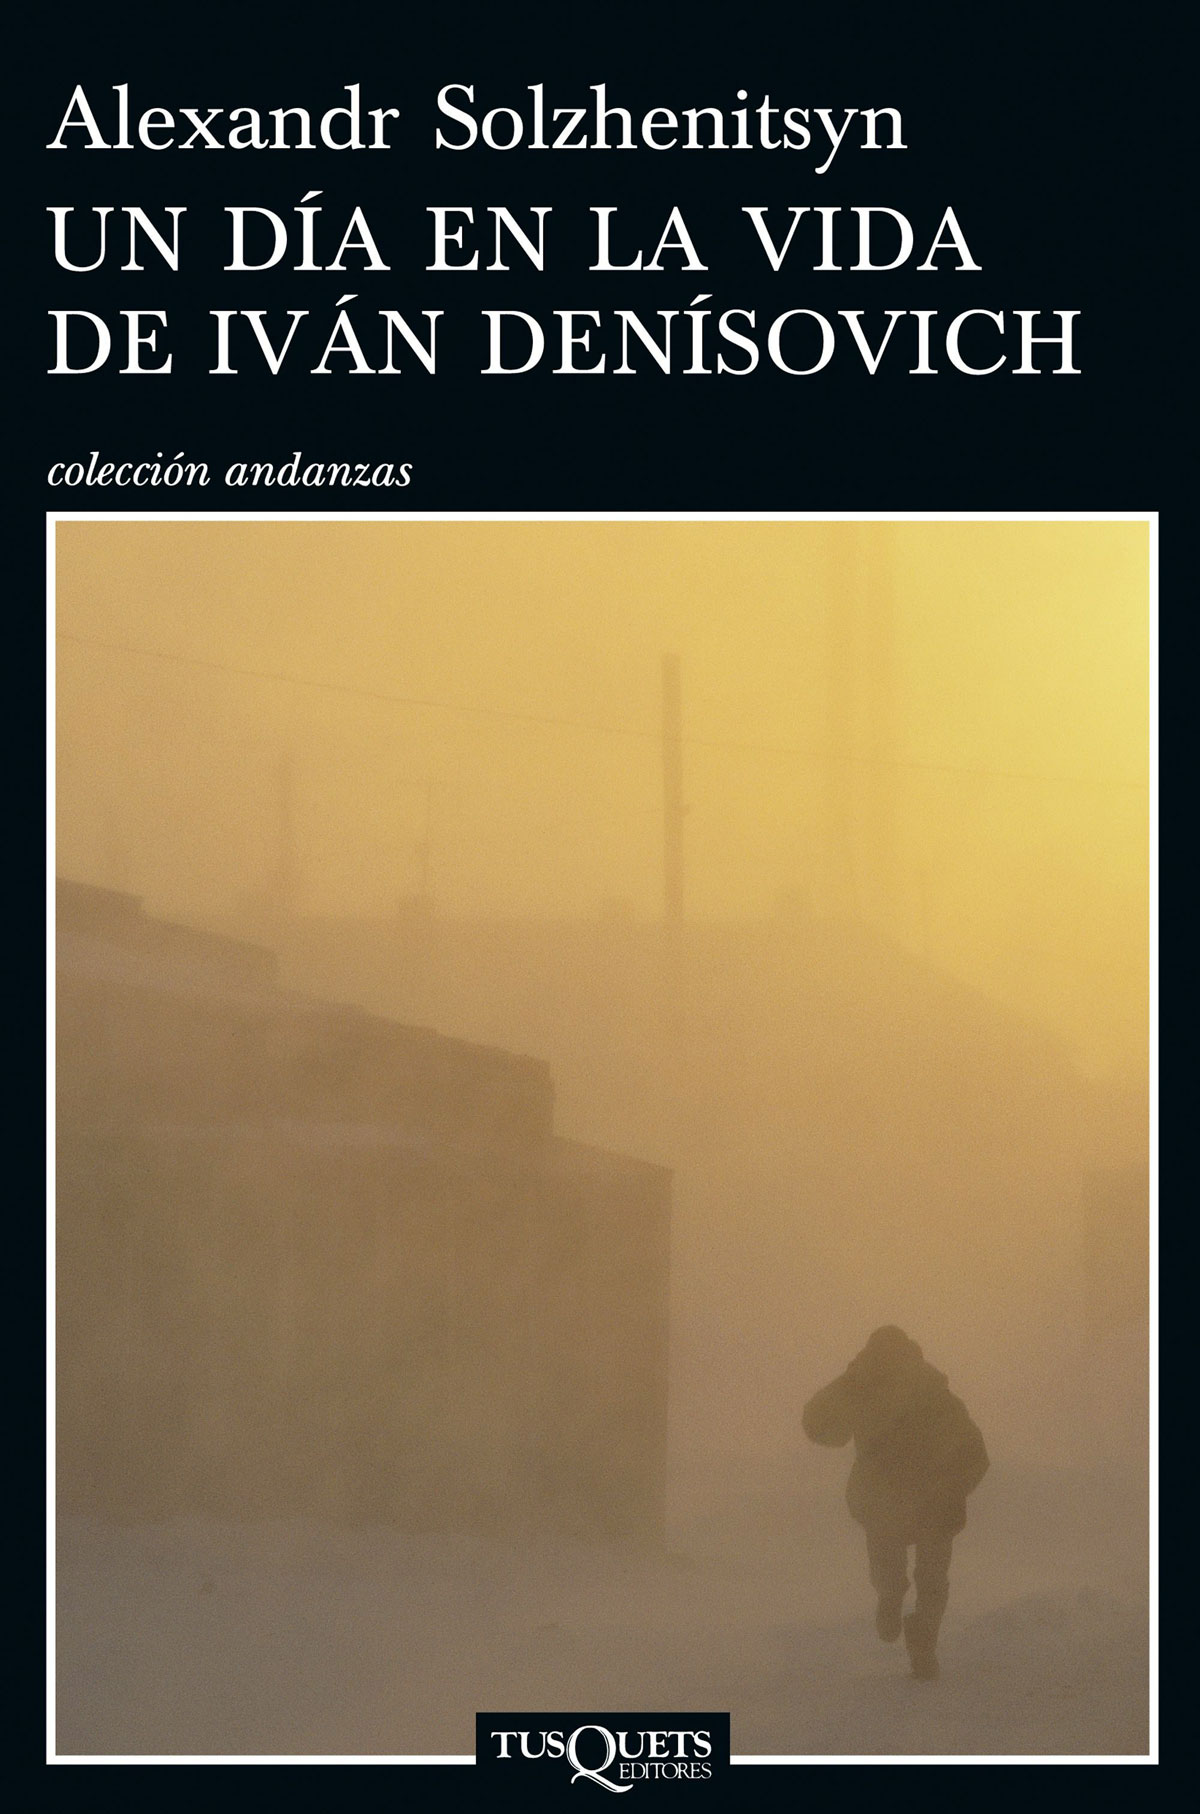 Portada de la novela Un día en la vida de Iván Denísovich, de Aleksandr Solzhenitsyn